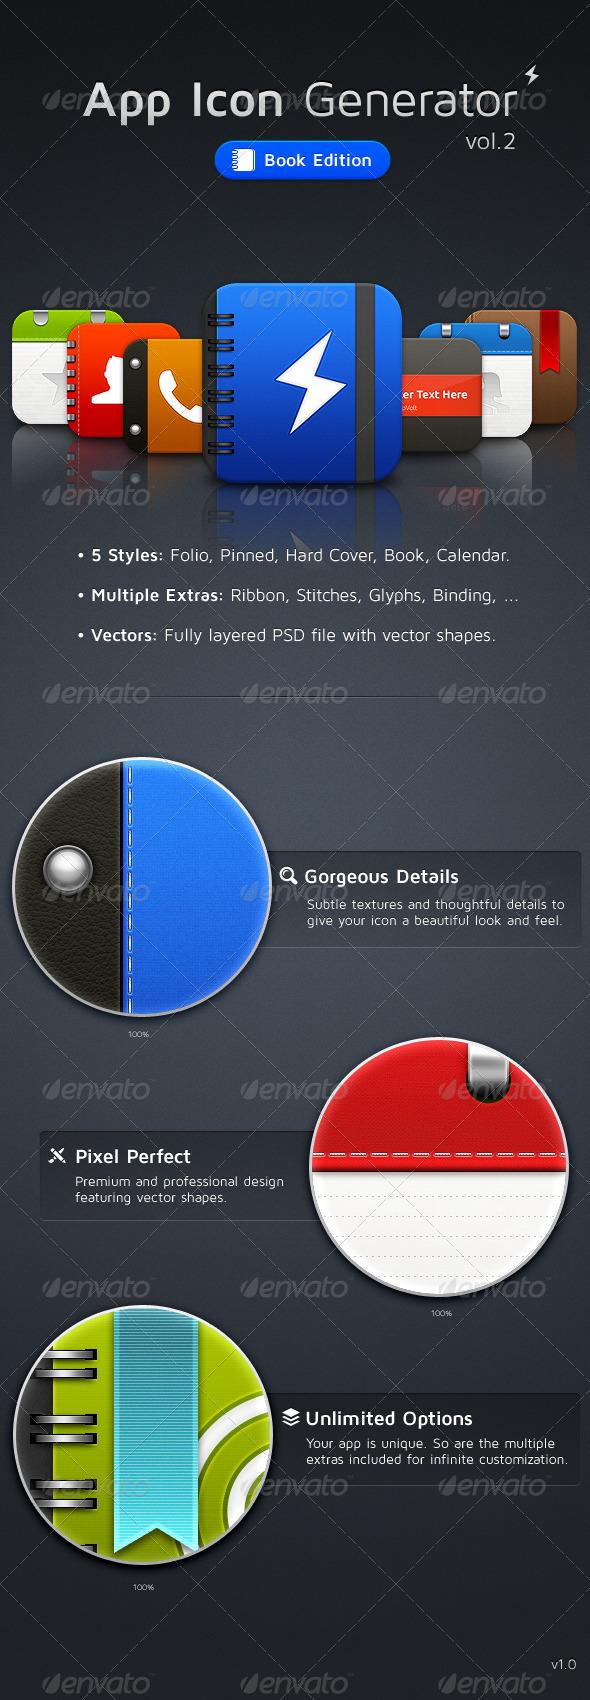 App Icon Generator Vol.2 - Software Icons